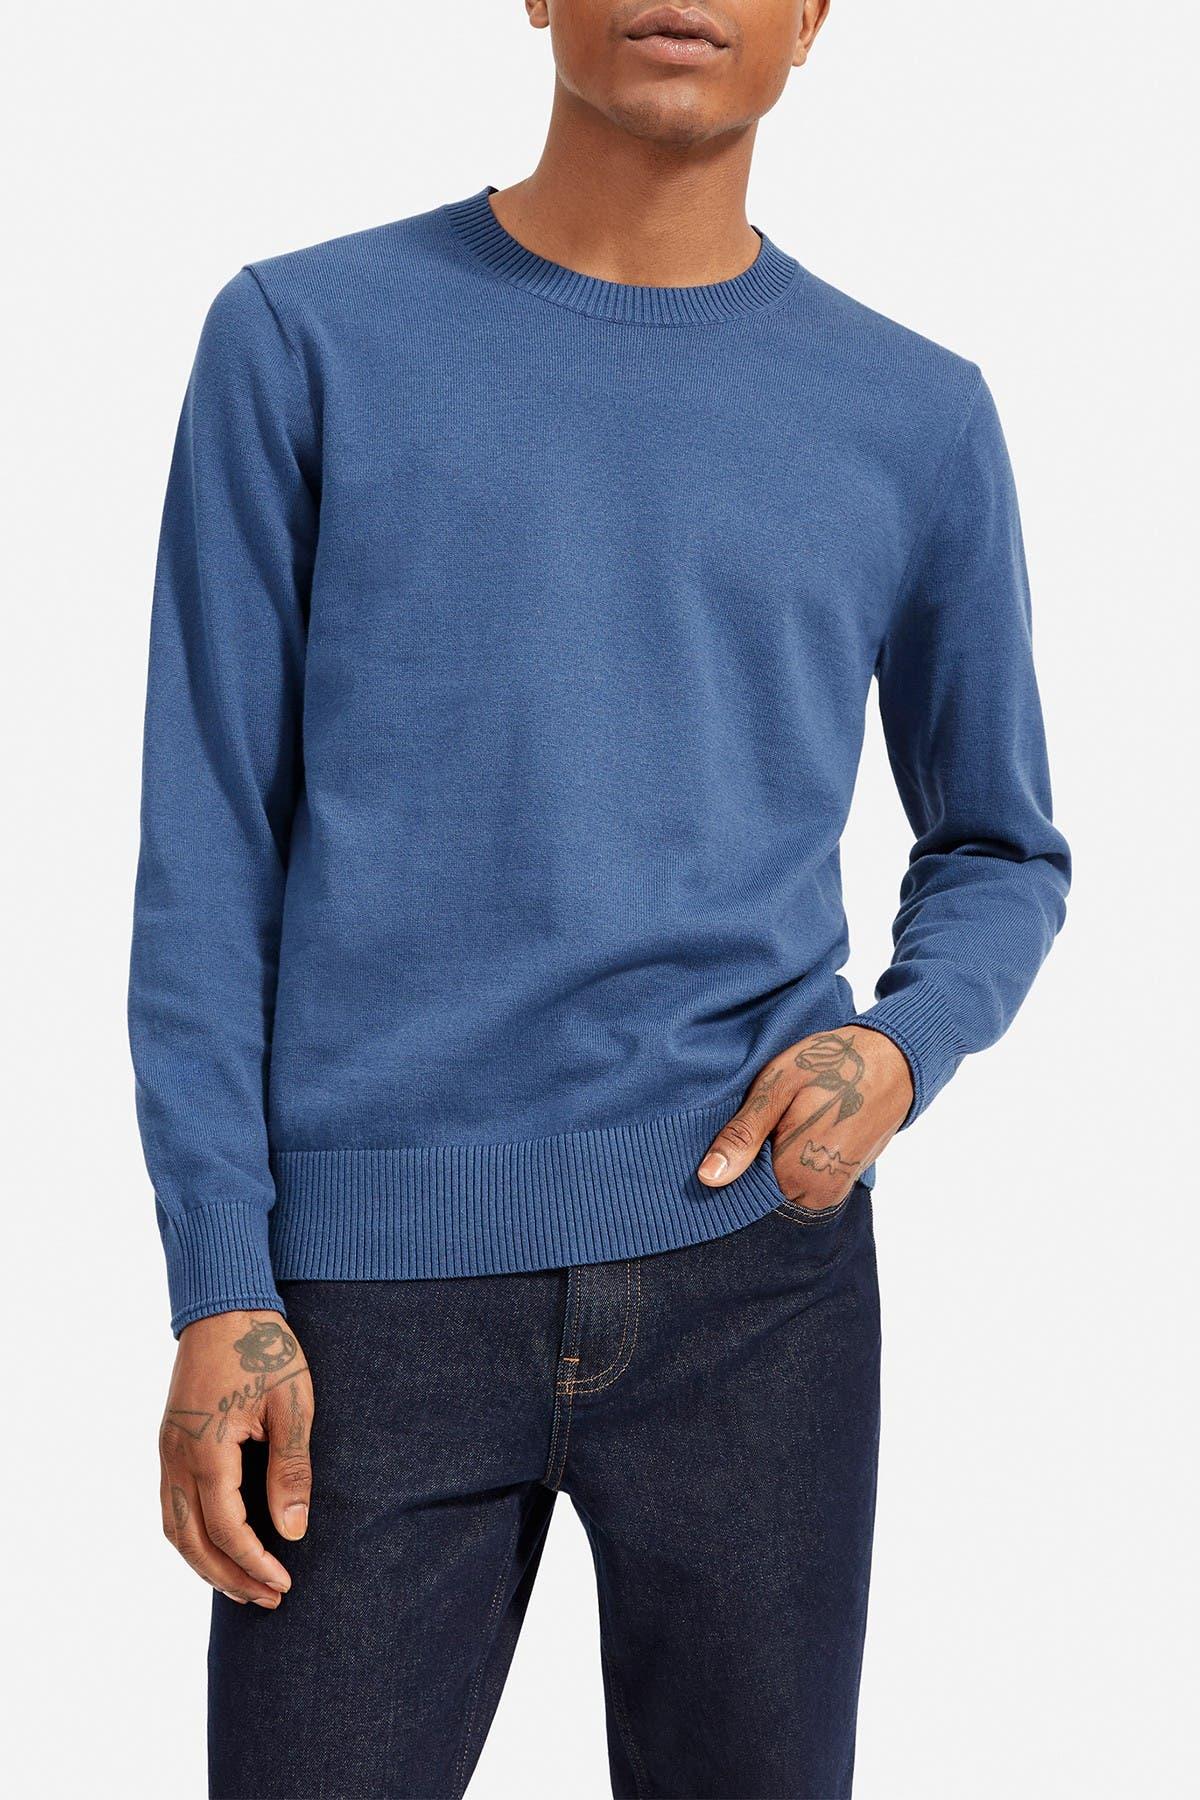 Image of EVERLANE Crew Neck Knit Sweater